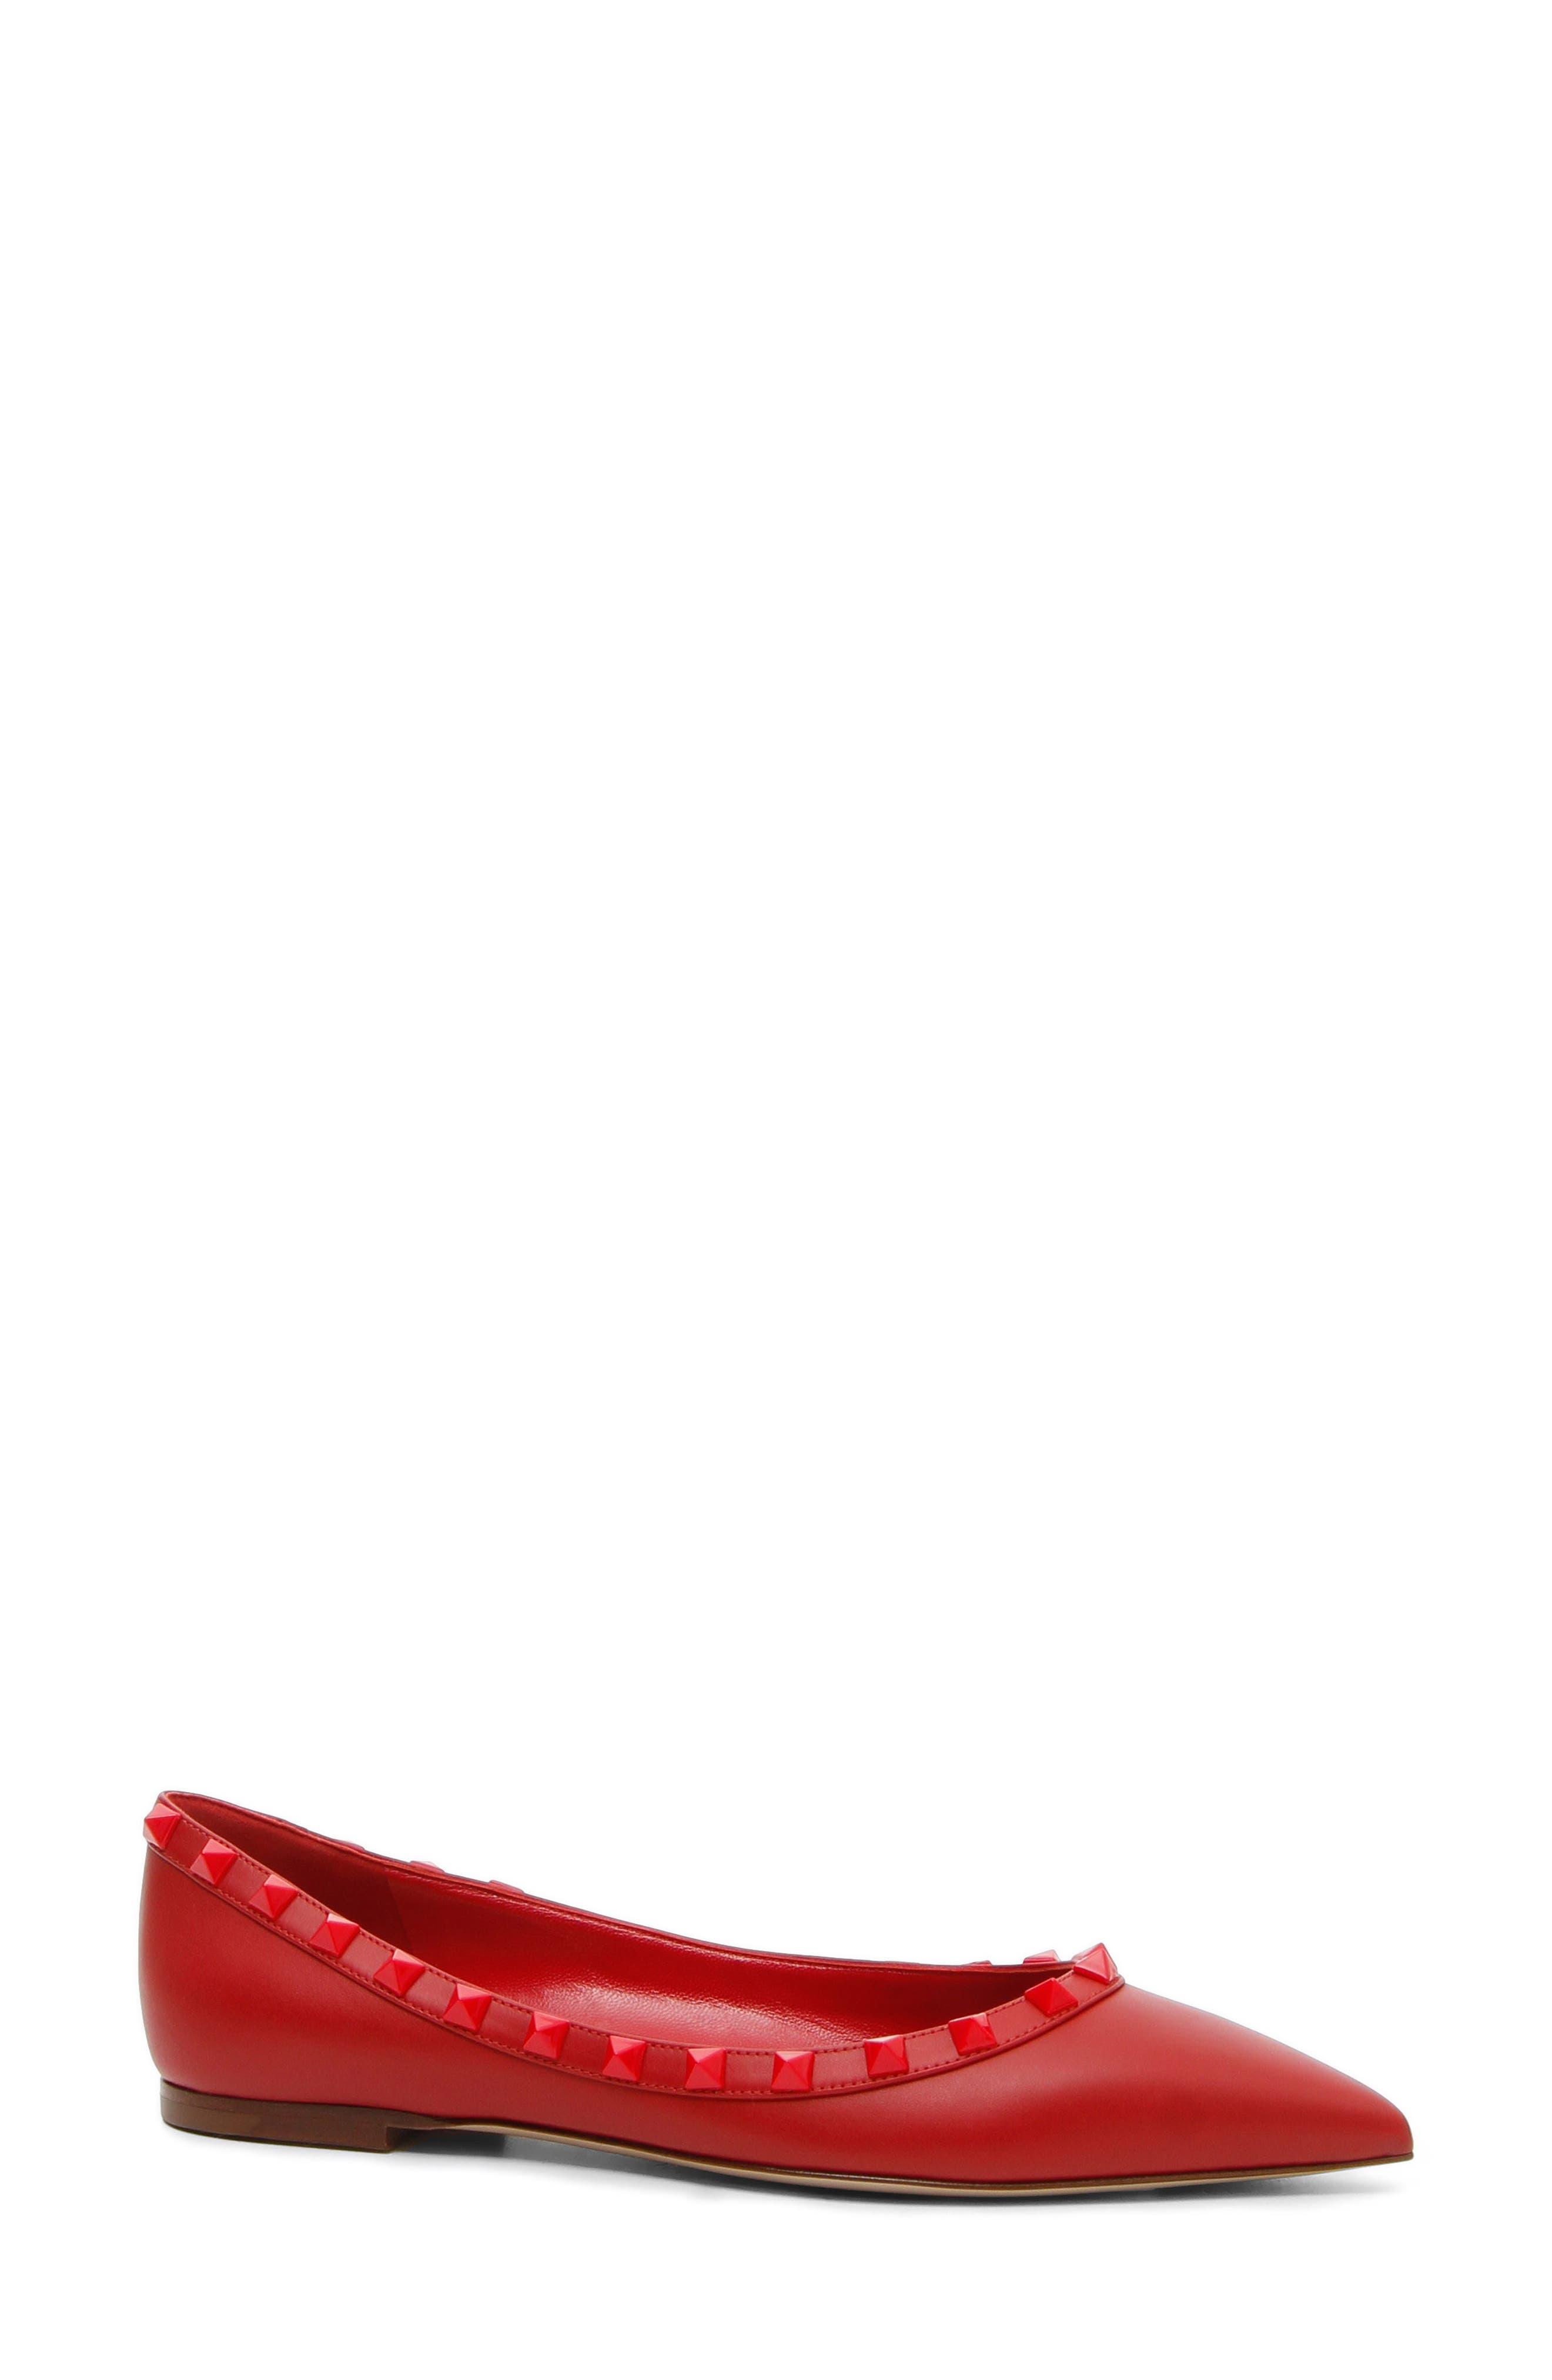 VALENTINO GARAVANI Rockstud Ballerina Flat (Women)